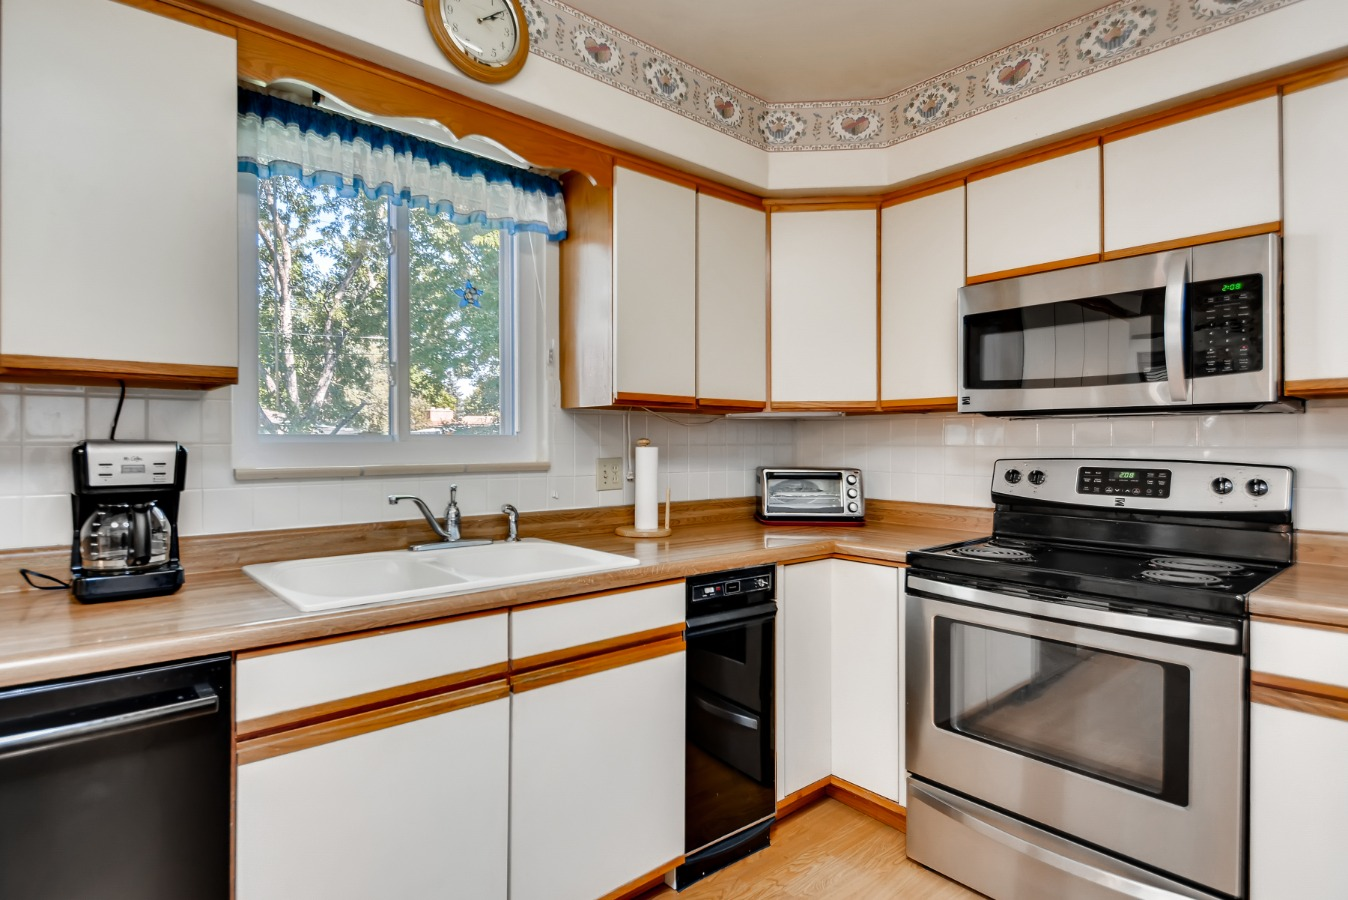 I Love it! Kitchen Sink with a backyard Window.